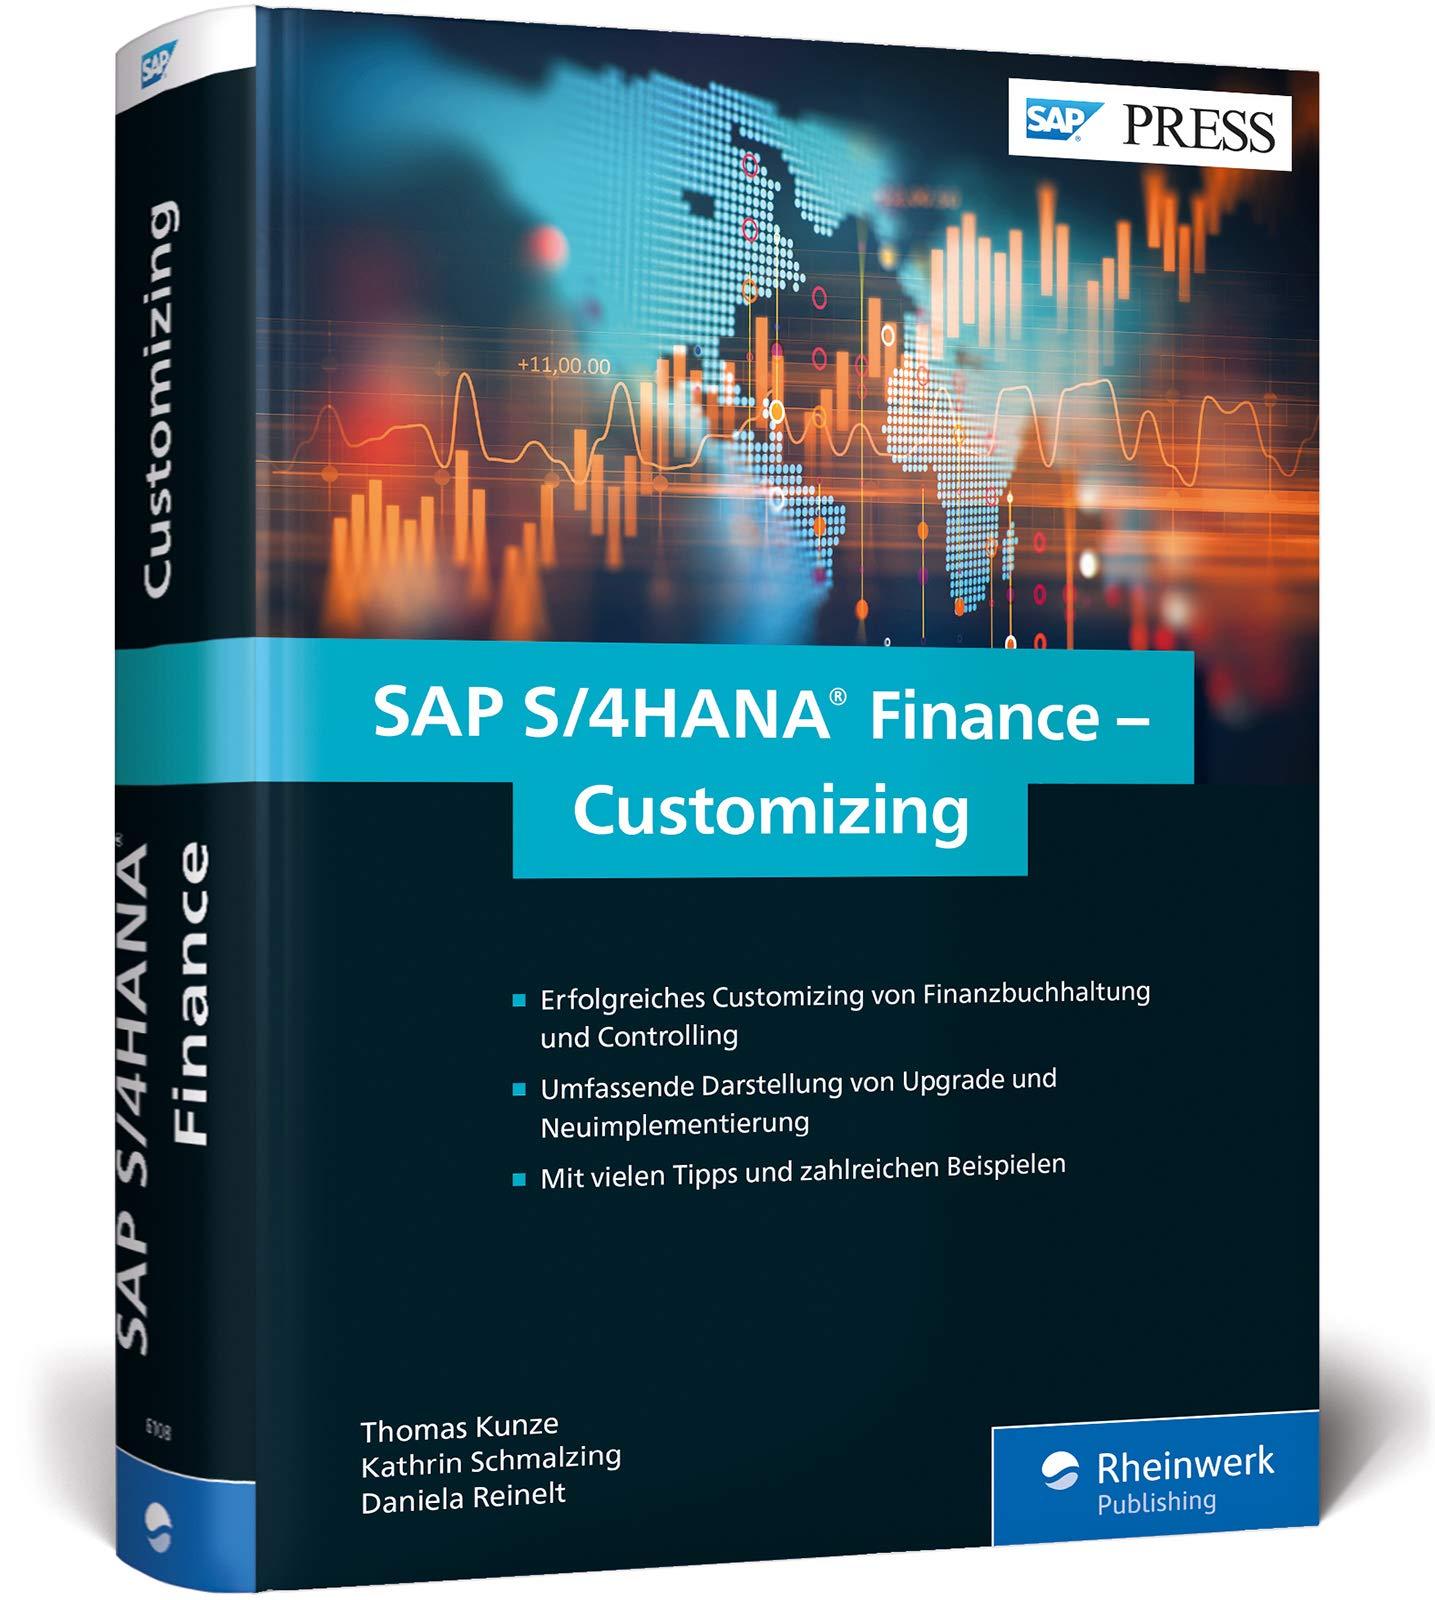 SAP S 4HANA Finance – Customizing  FI CO In SAP S 4HANA Erfolgreich Implementieren  SAP PRESS